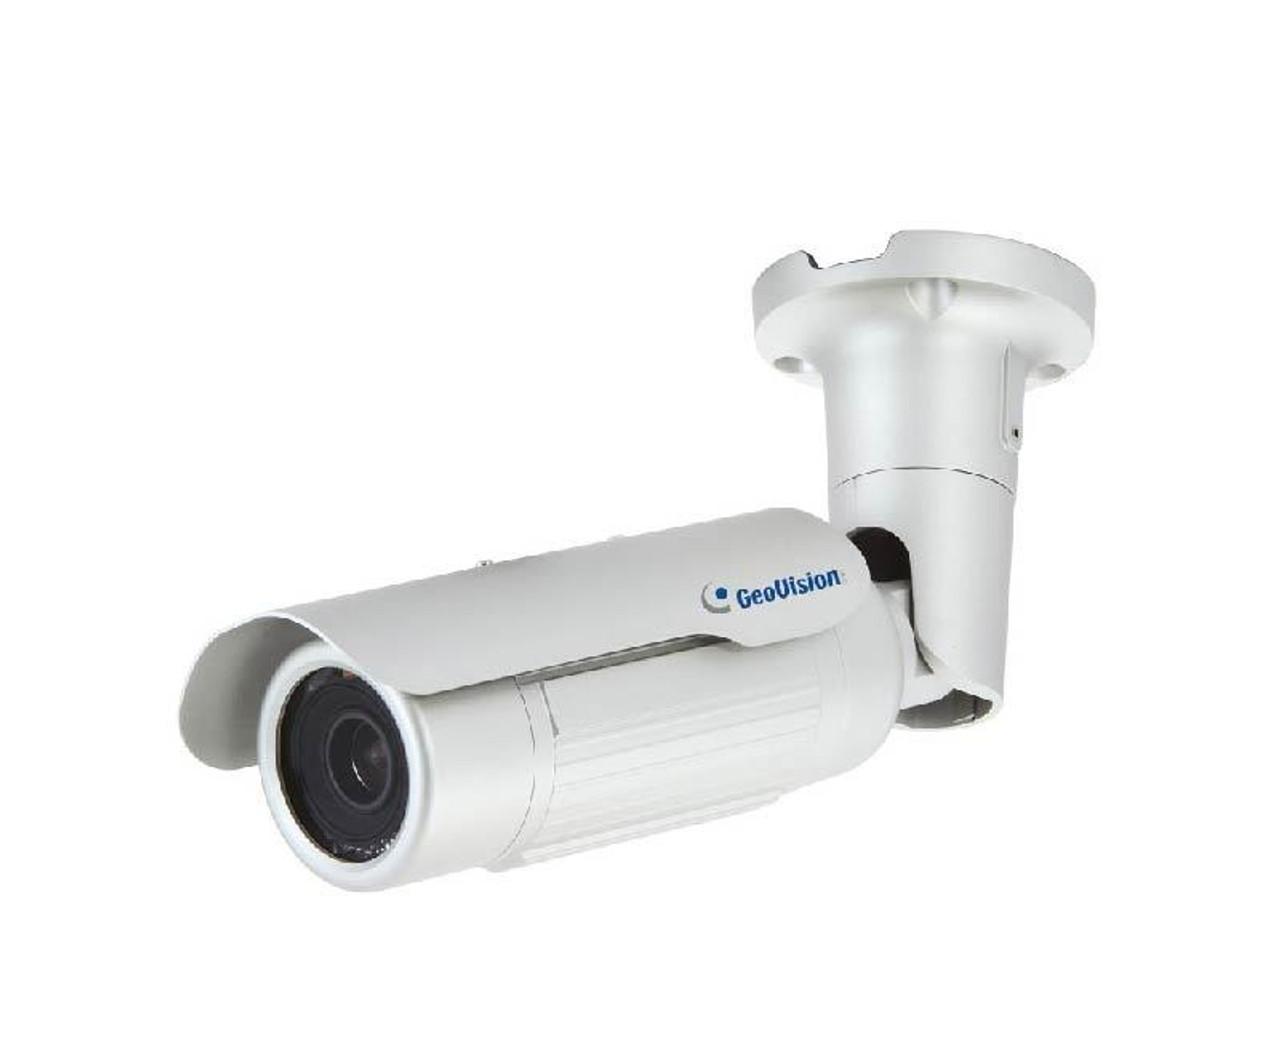 GeoVision GV-EBL2111 2MP H.264 4.3X Zoom Super Low Lux WDR IR Bullet IP Camera